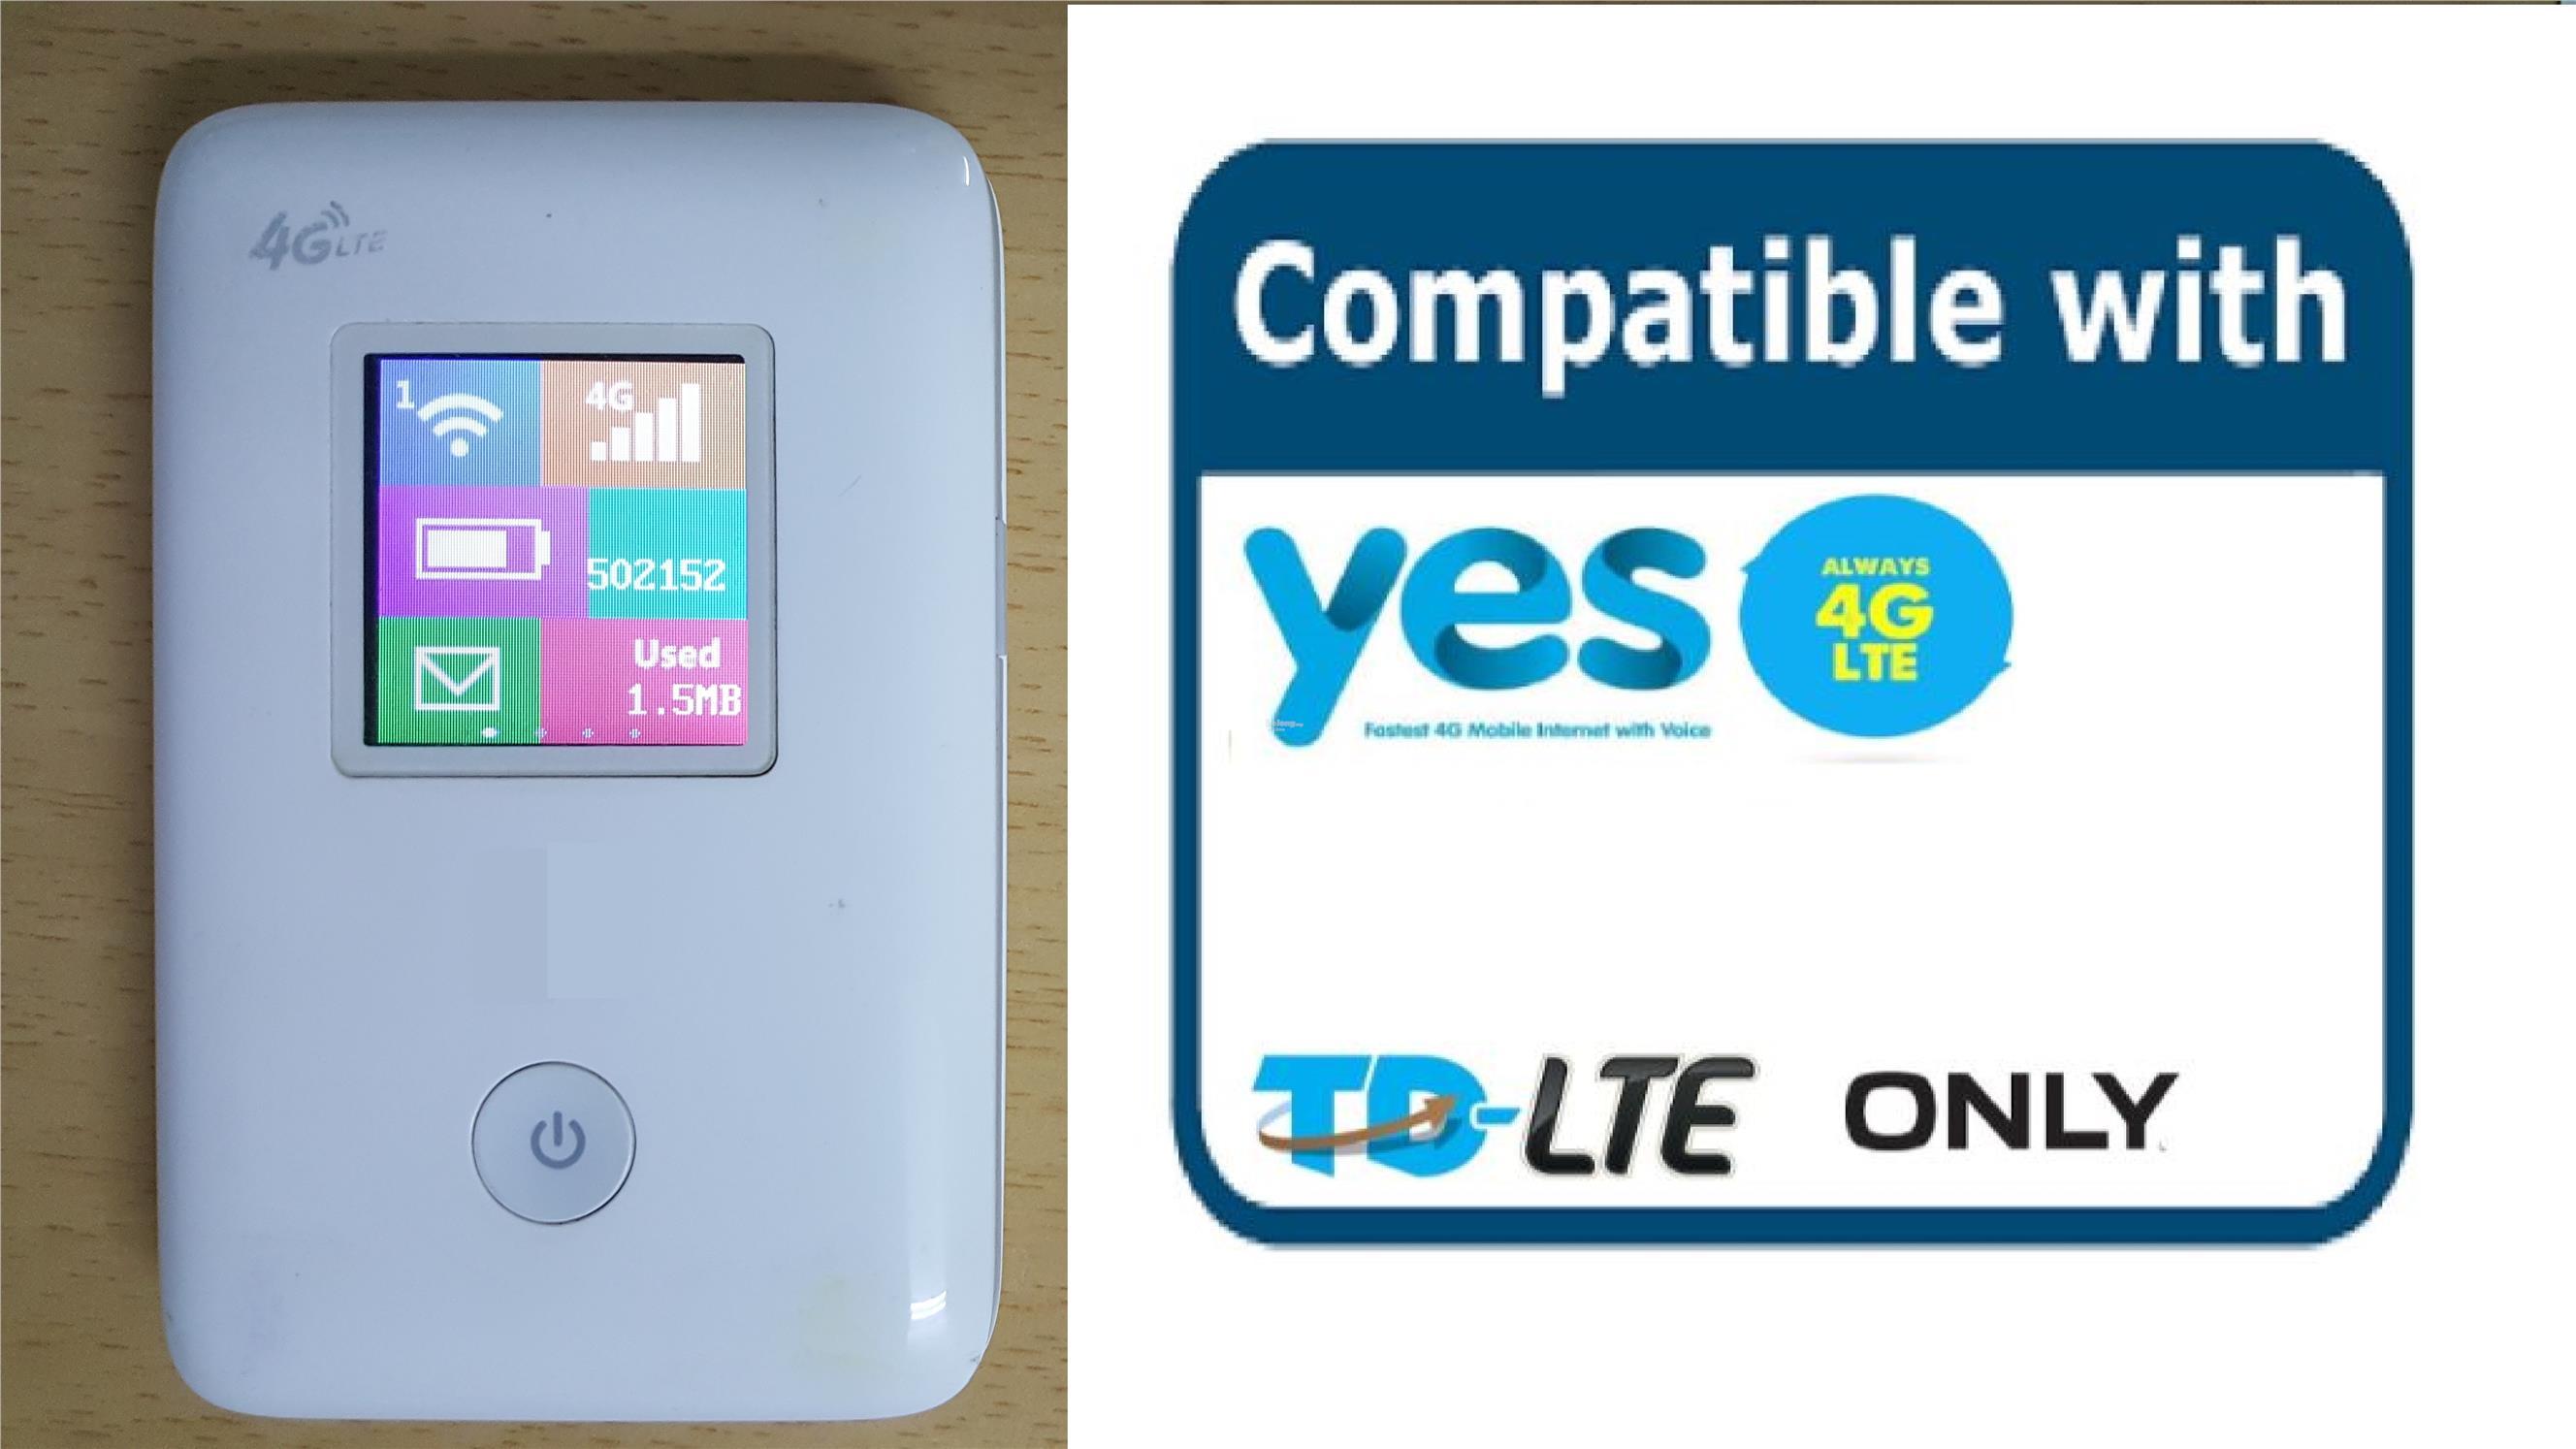 Yes 4G LTE Modem WiFi - LCD